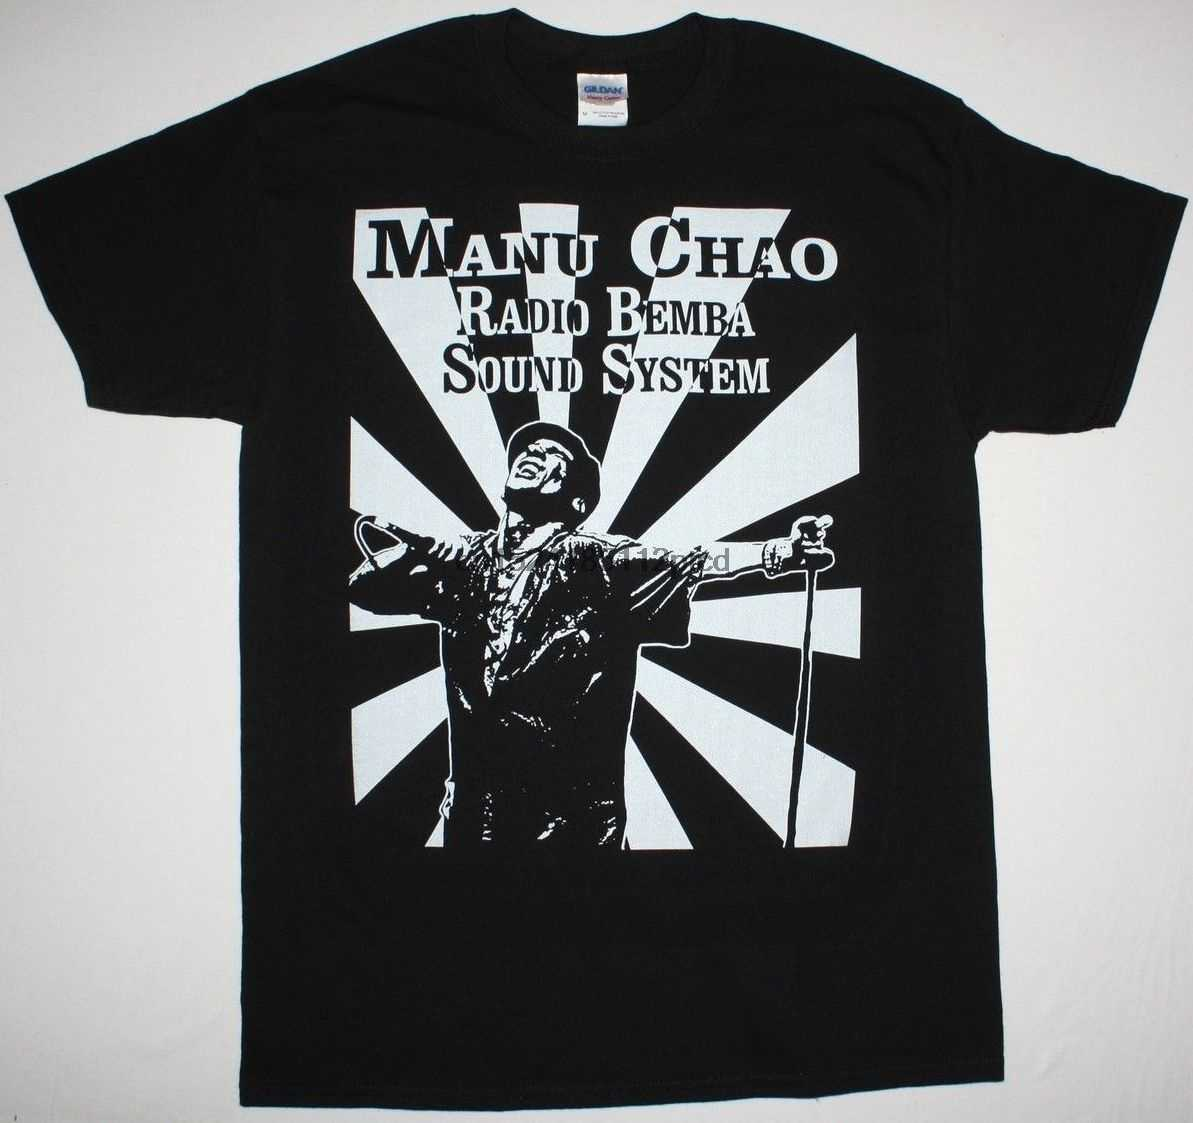 MANU CHAO RADIO BEMBA, sistema de sonido negro camiseta MANO NEGRA SKA PUNK RADIOLINA